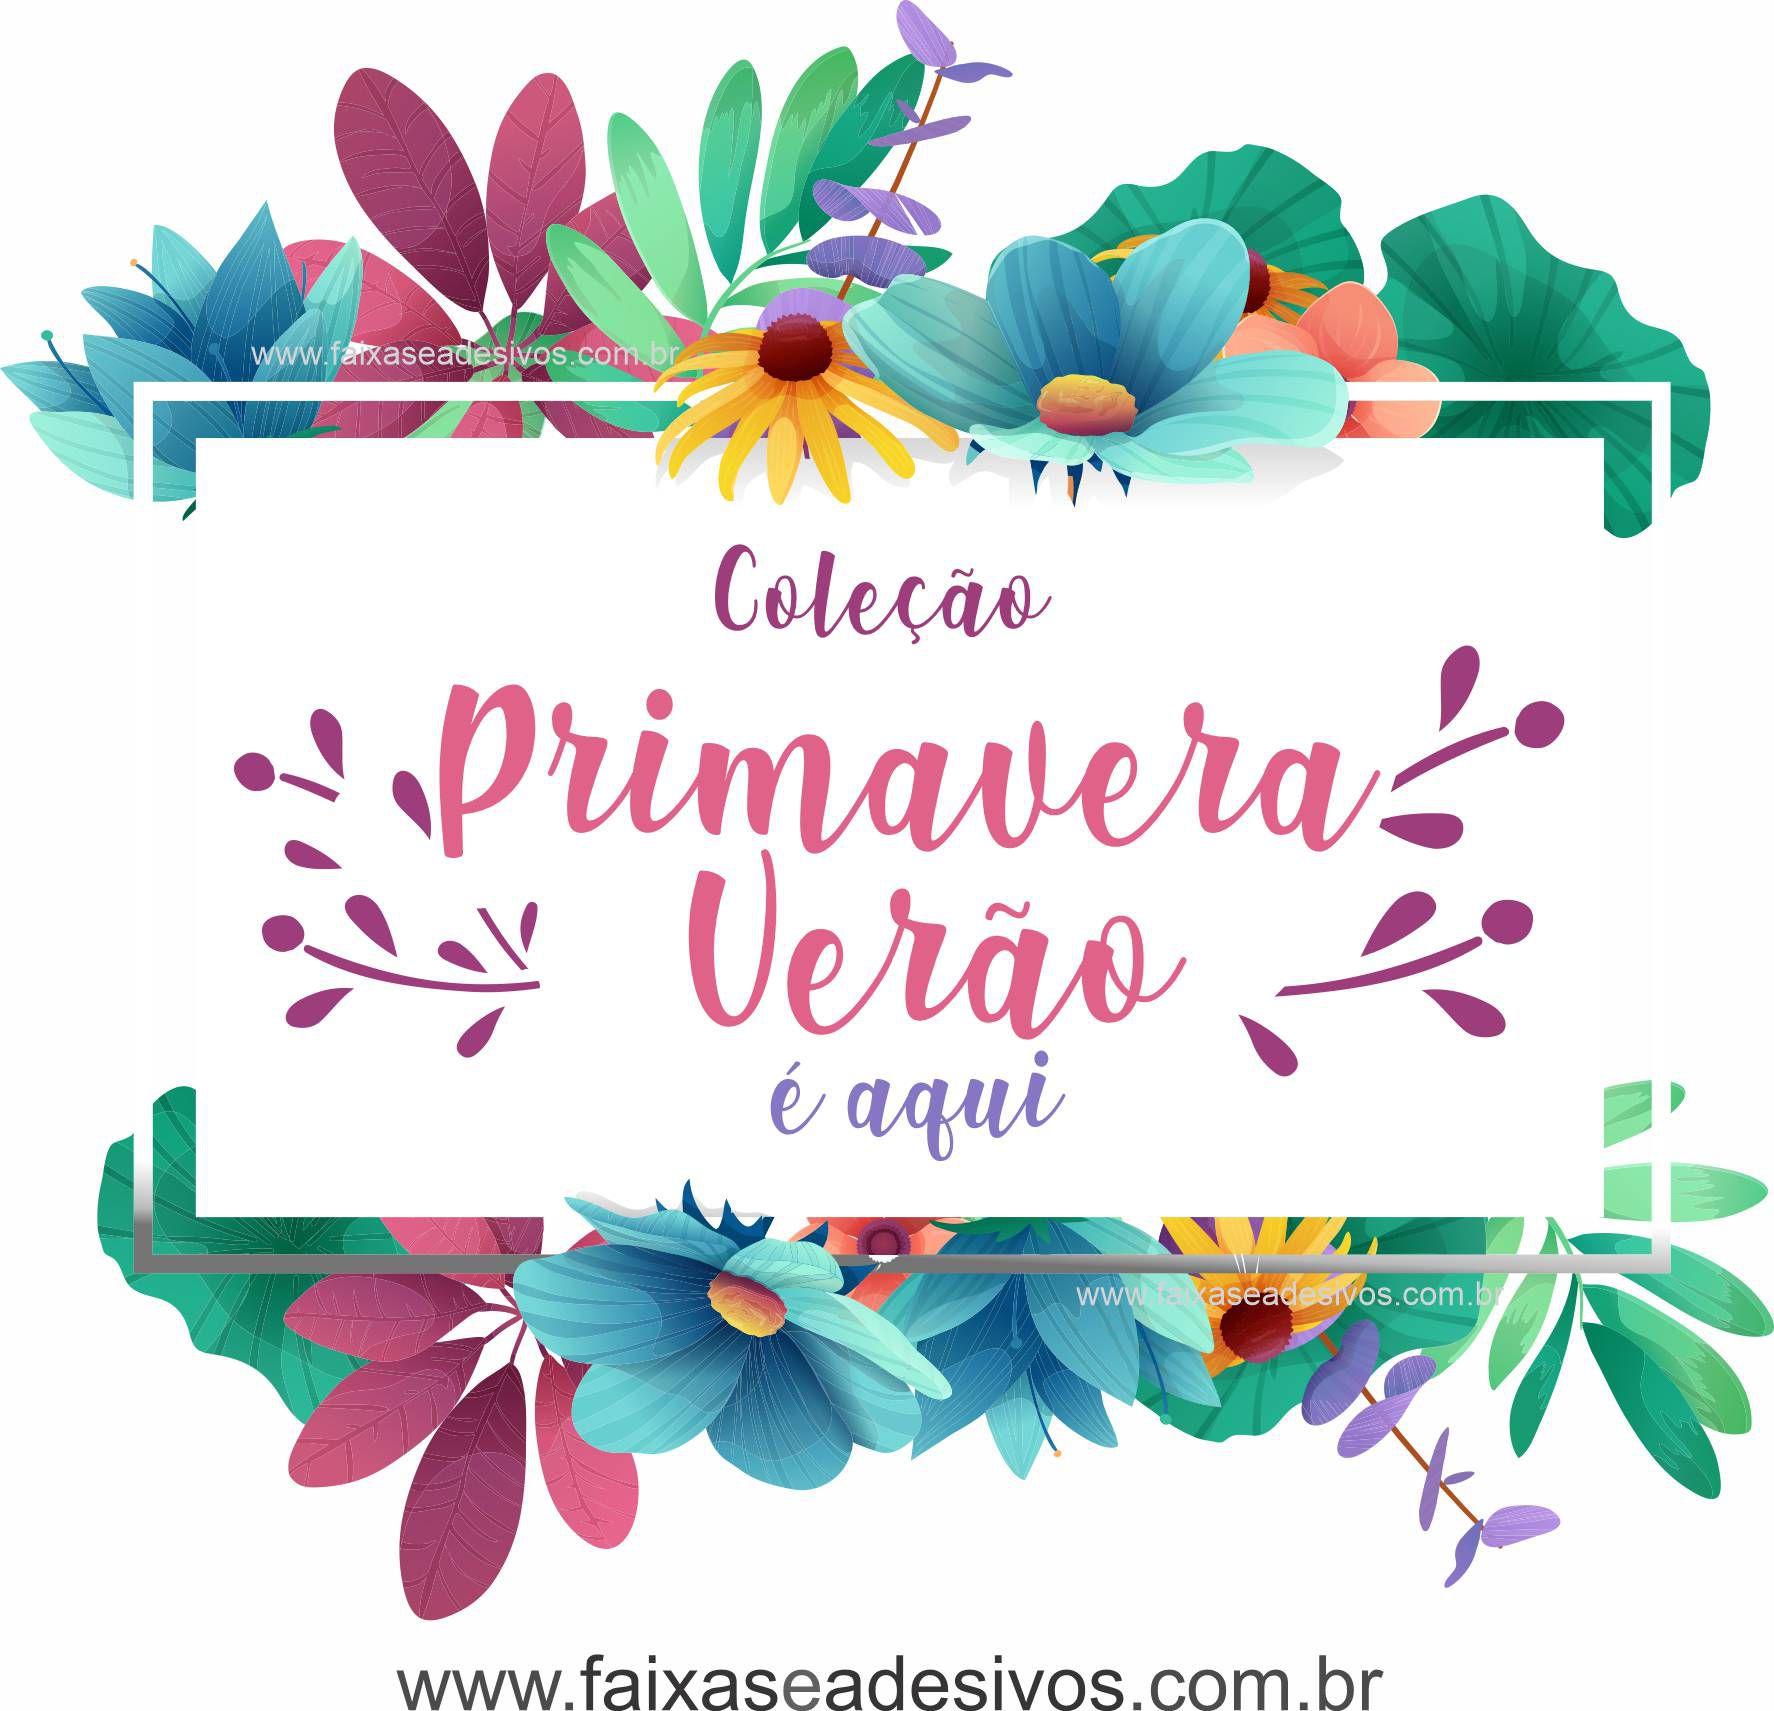 1A4918 - Adesivo Primavera-Verão - Floral Celeste  - Fac Signs